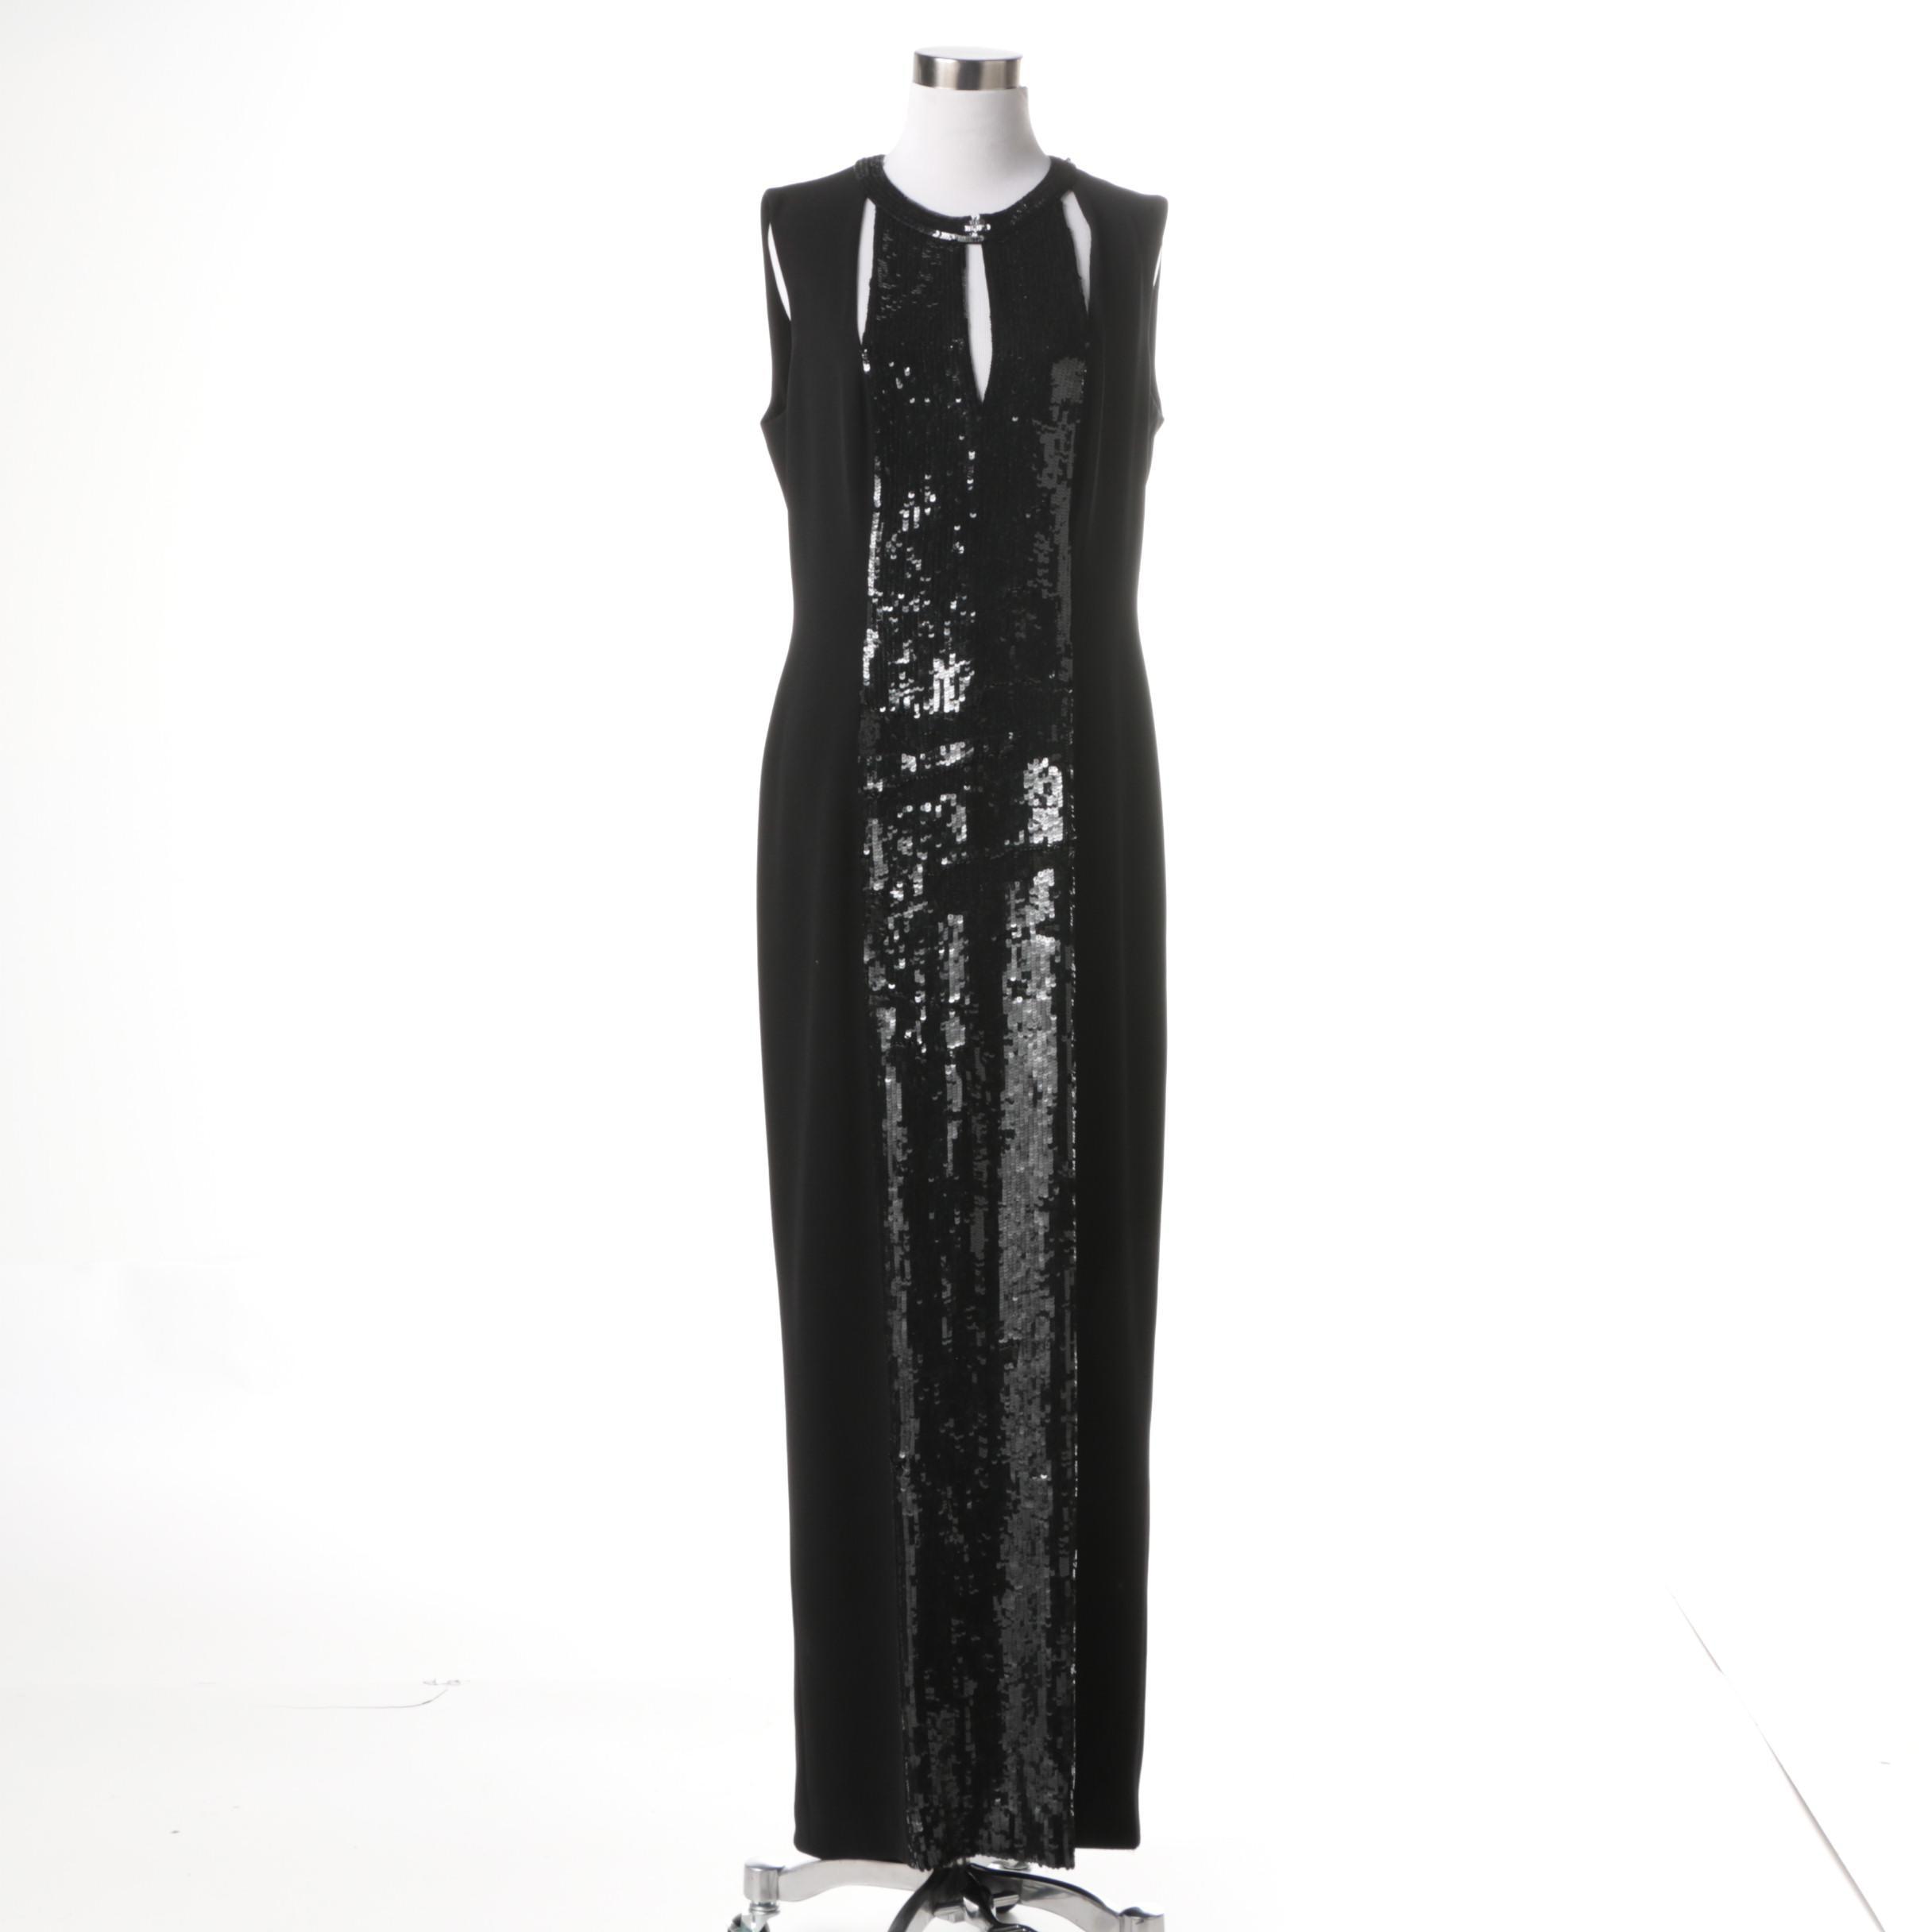 Escade Black Sequin Evening Dress